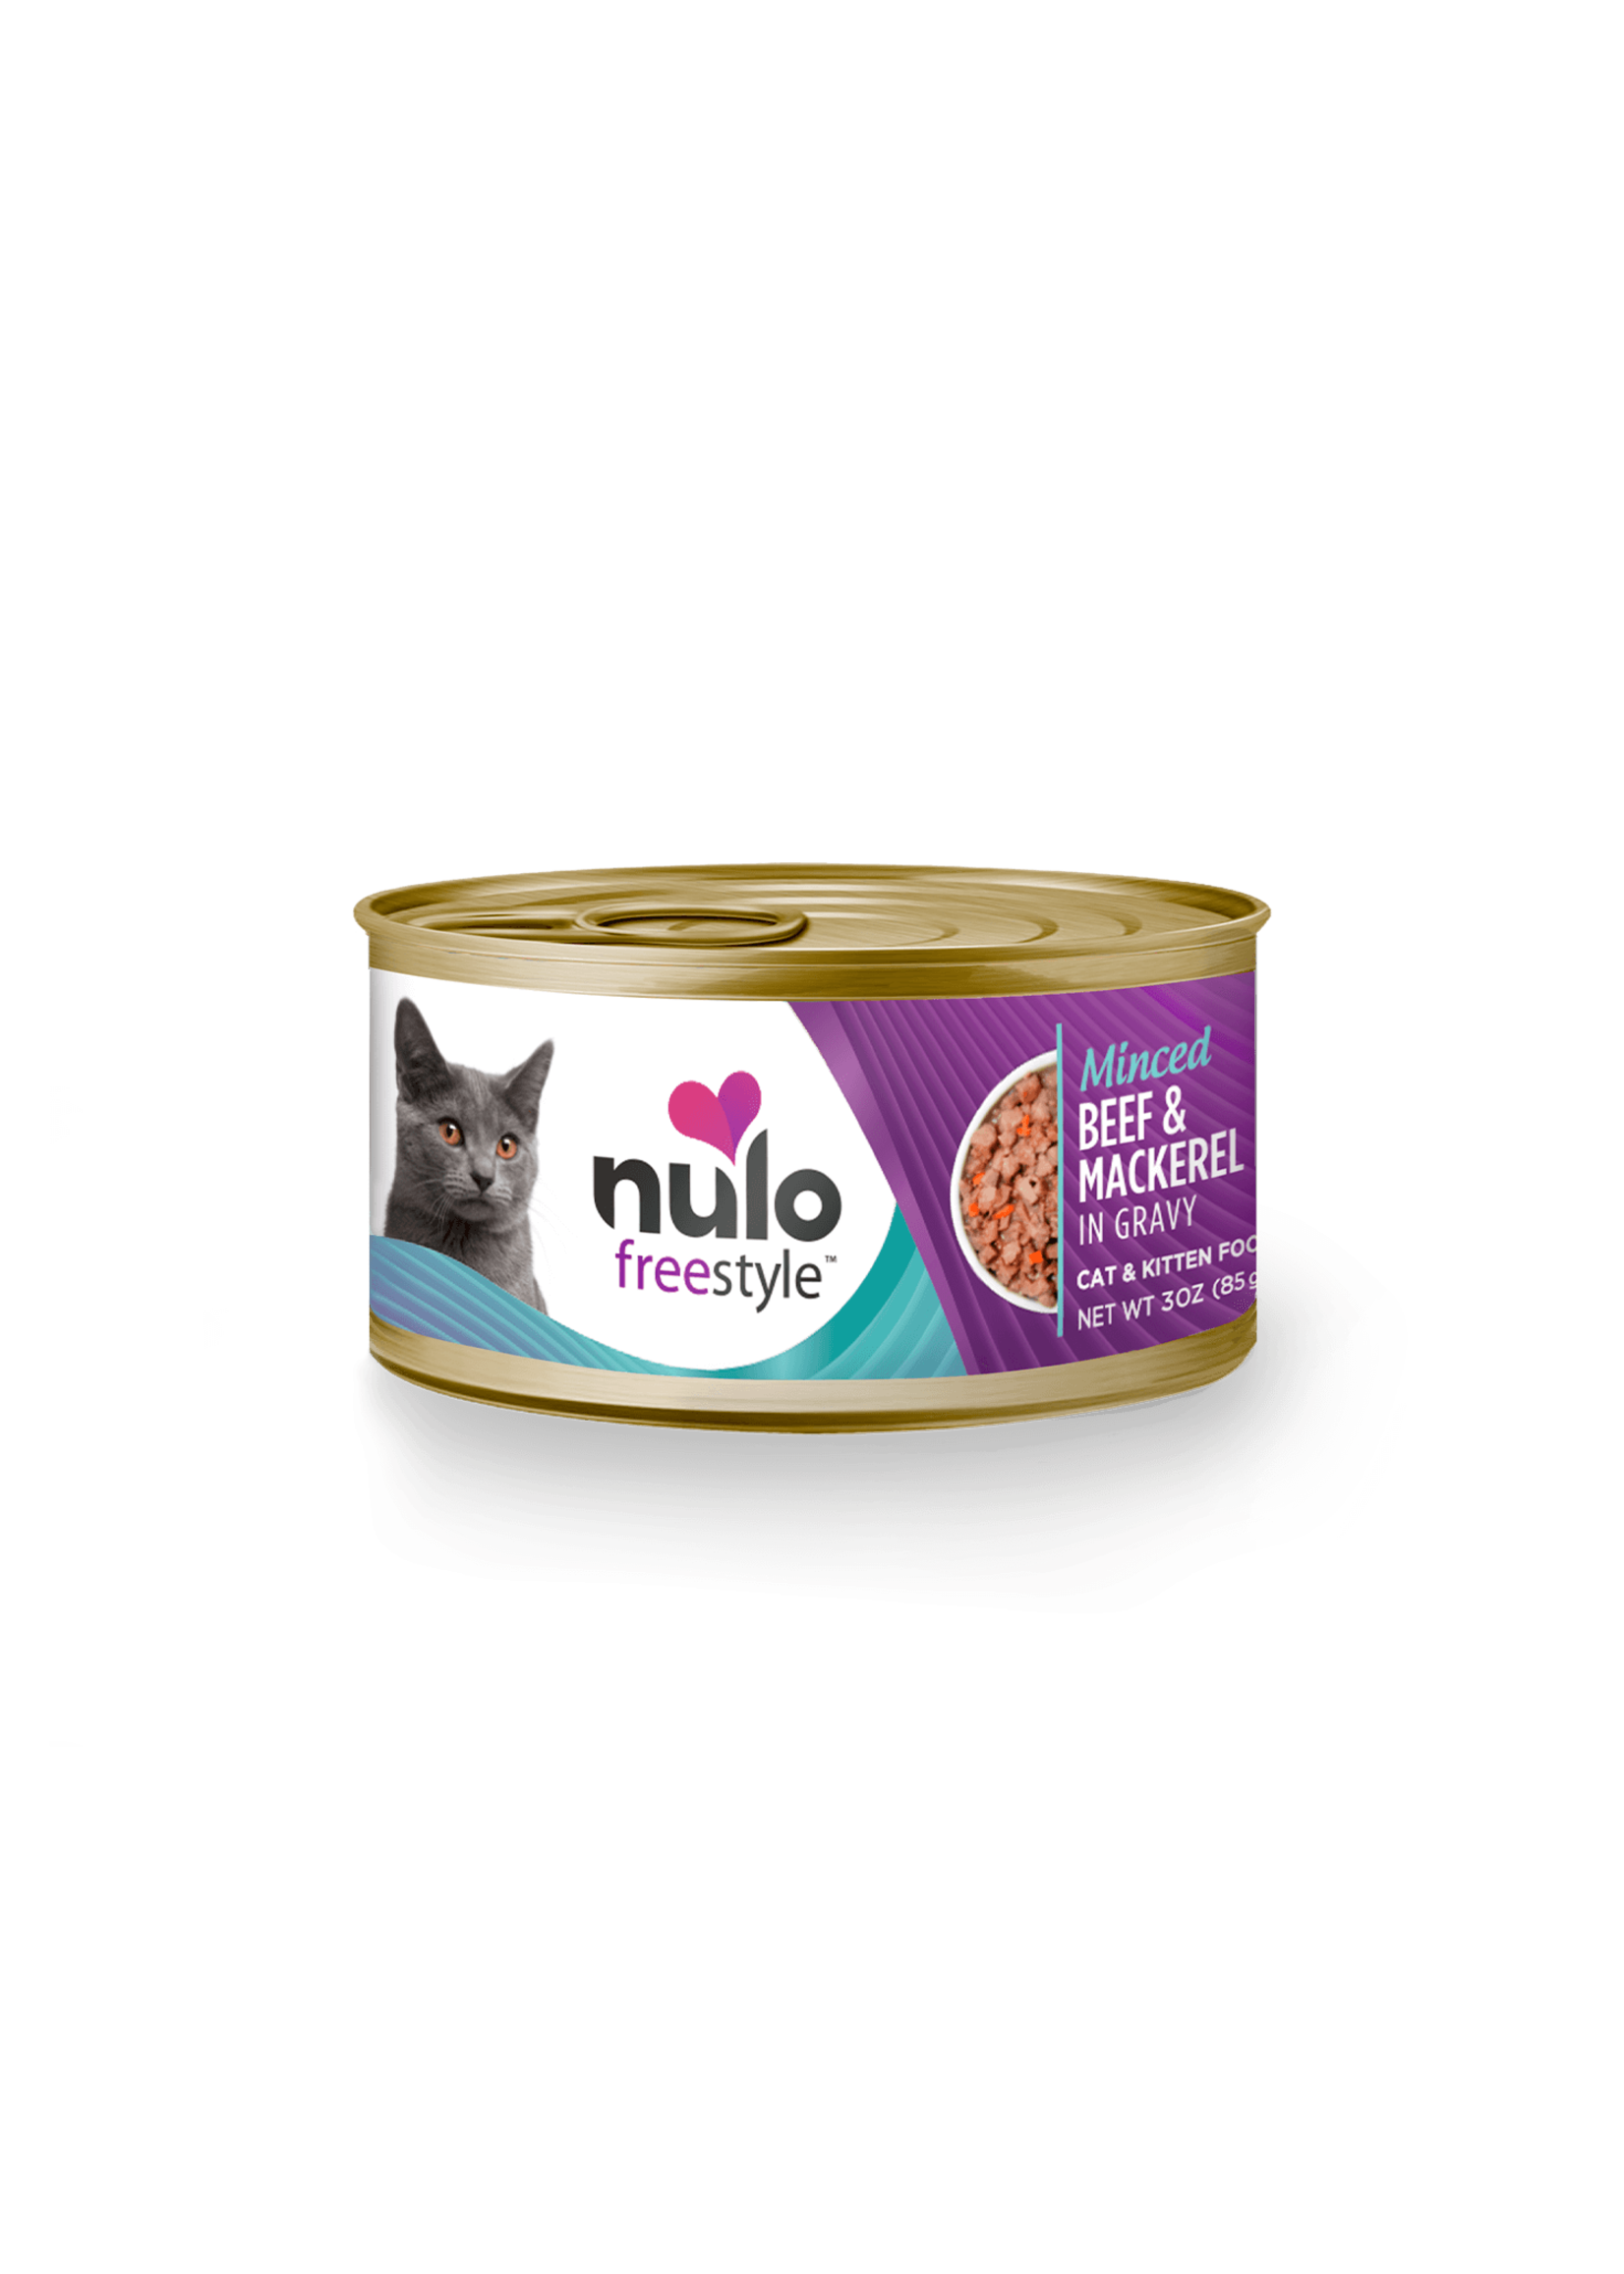 Nulo Nulo FreeStyle Grain Free Cat Food Minced Beef & Mackerel in Gravy, 3oz Can